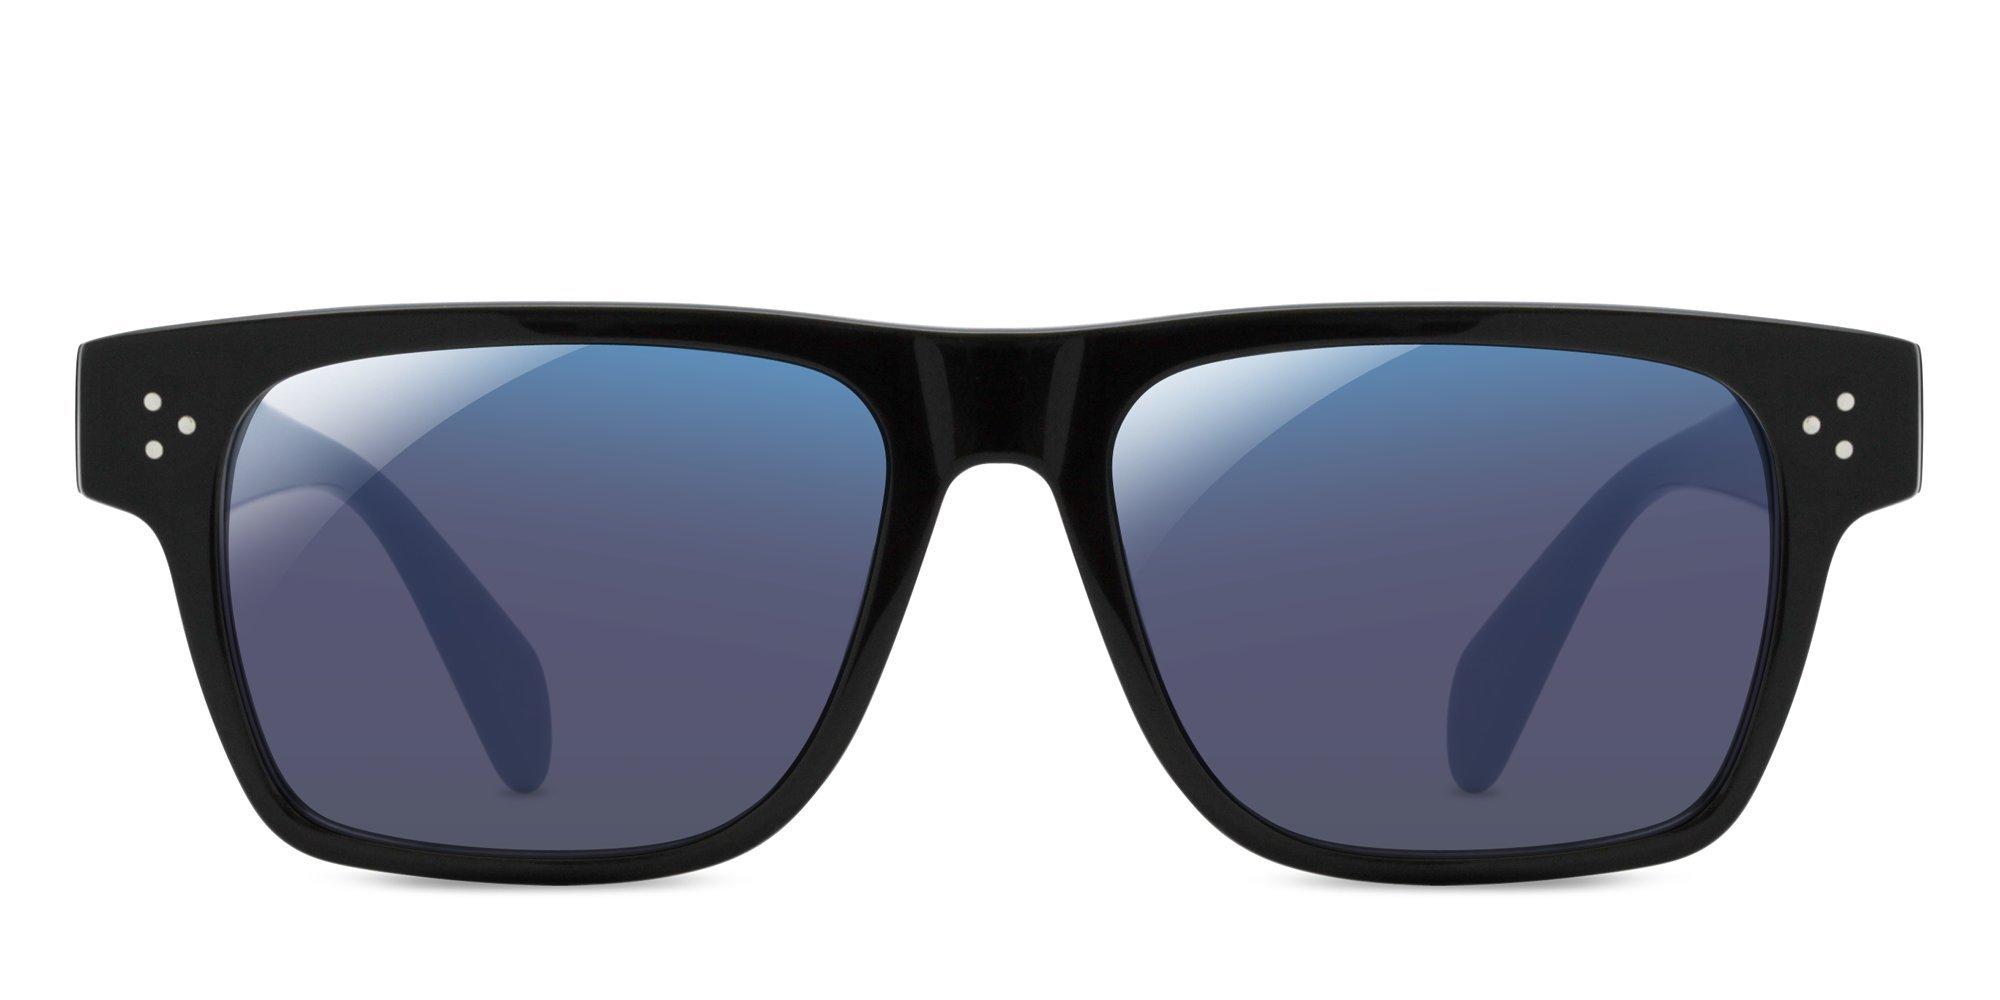 Enchroma Solano - Glasses for the Color Blind (Black) by Enchroma